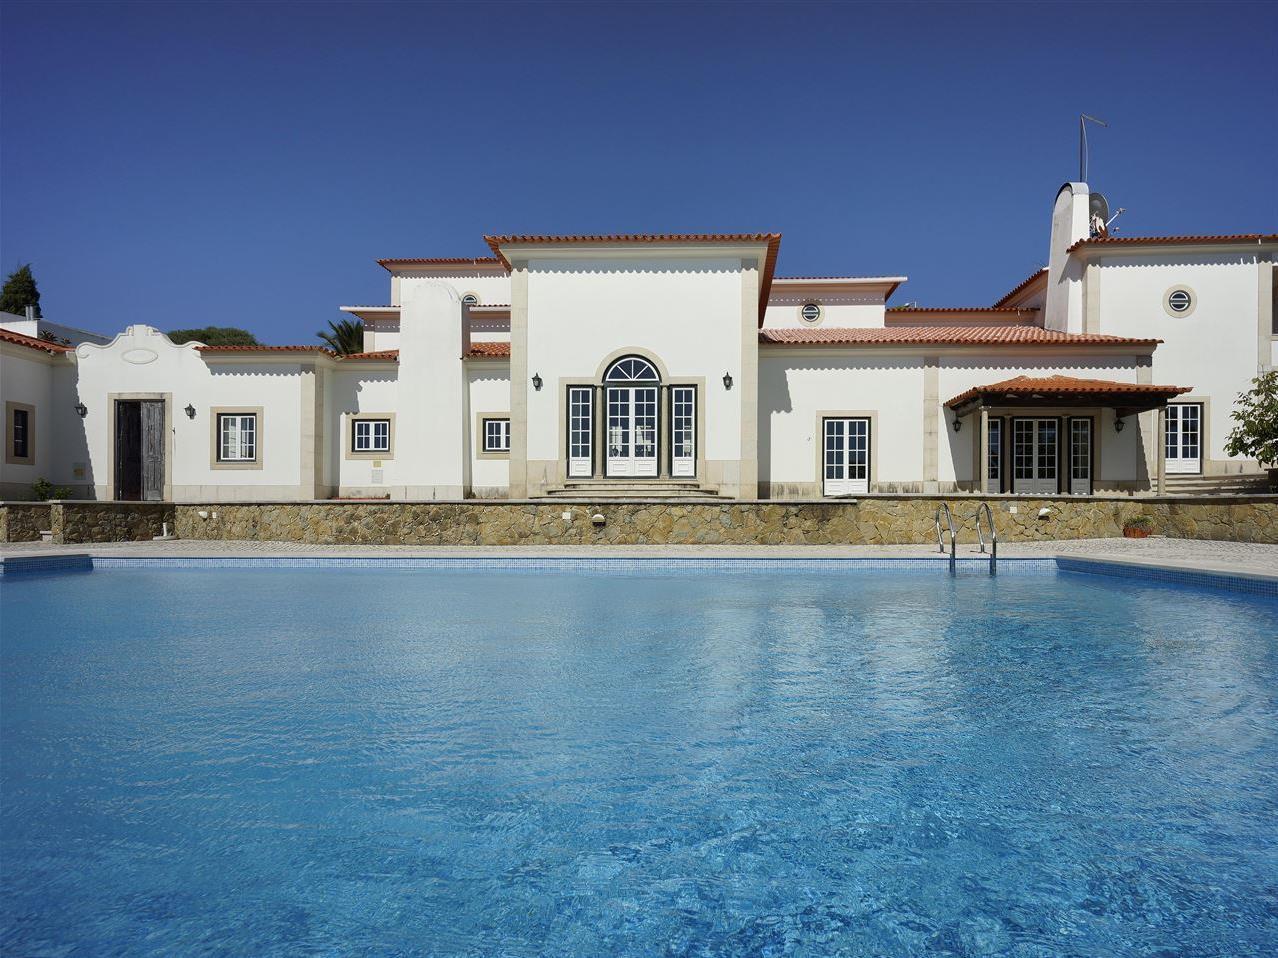 Single Family Home for Sale at House, 5 bedrooms, for Sale Estoril, Cascais, Lisboa Portugal